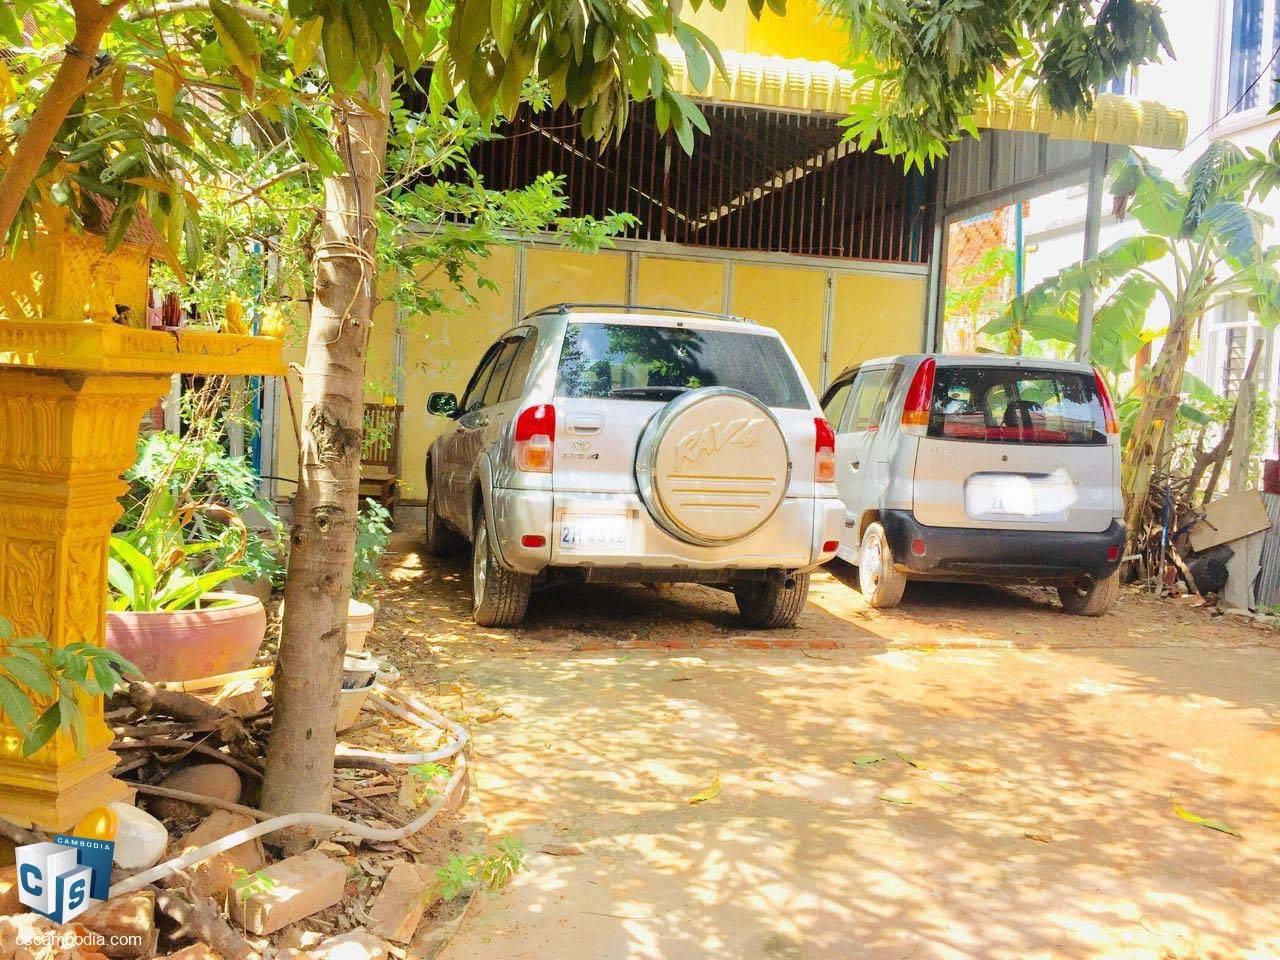 144 Sq Meters of Land – For Rent – Steung Thmei Village – Svay Dangkum – Siem Reap